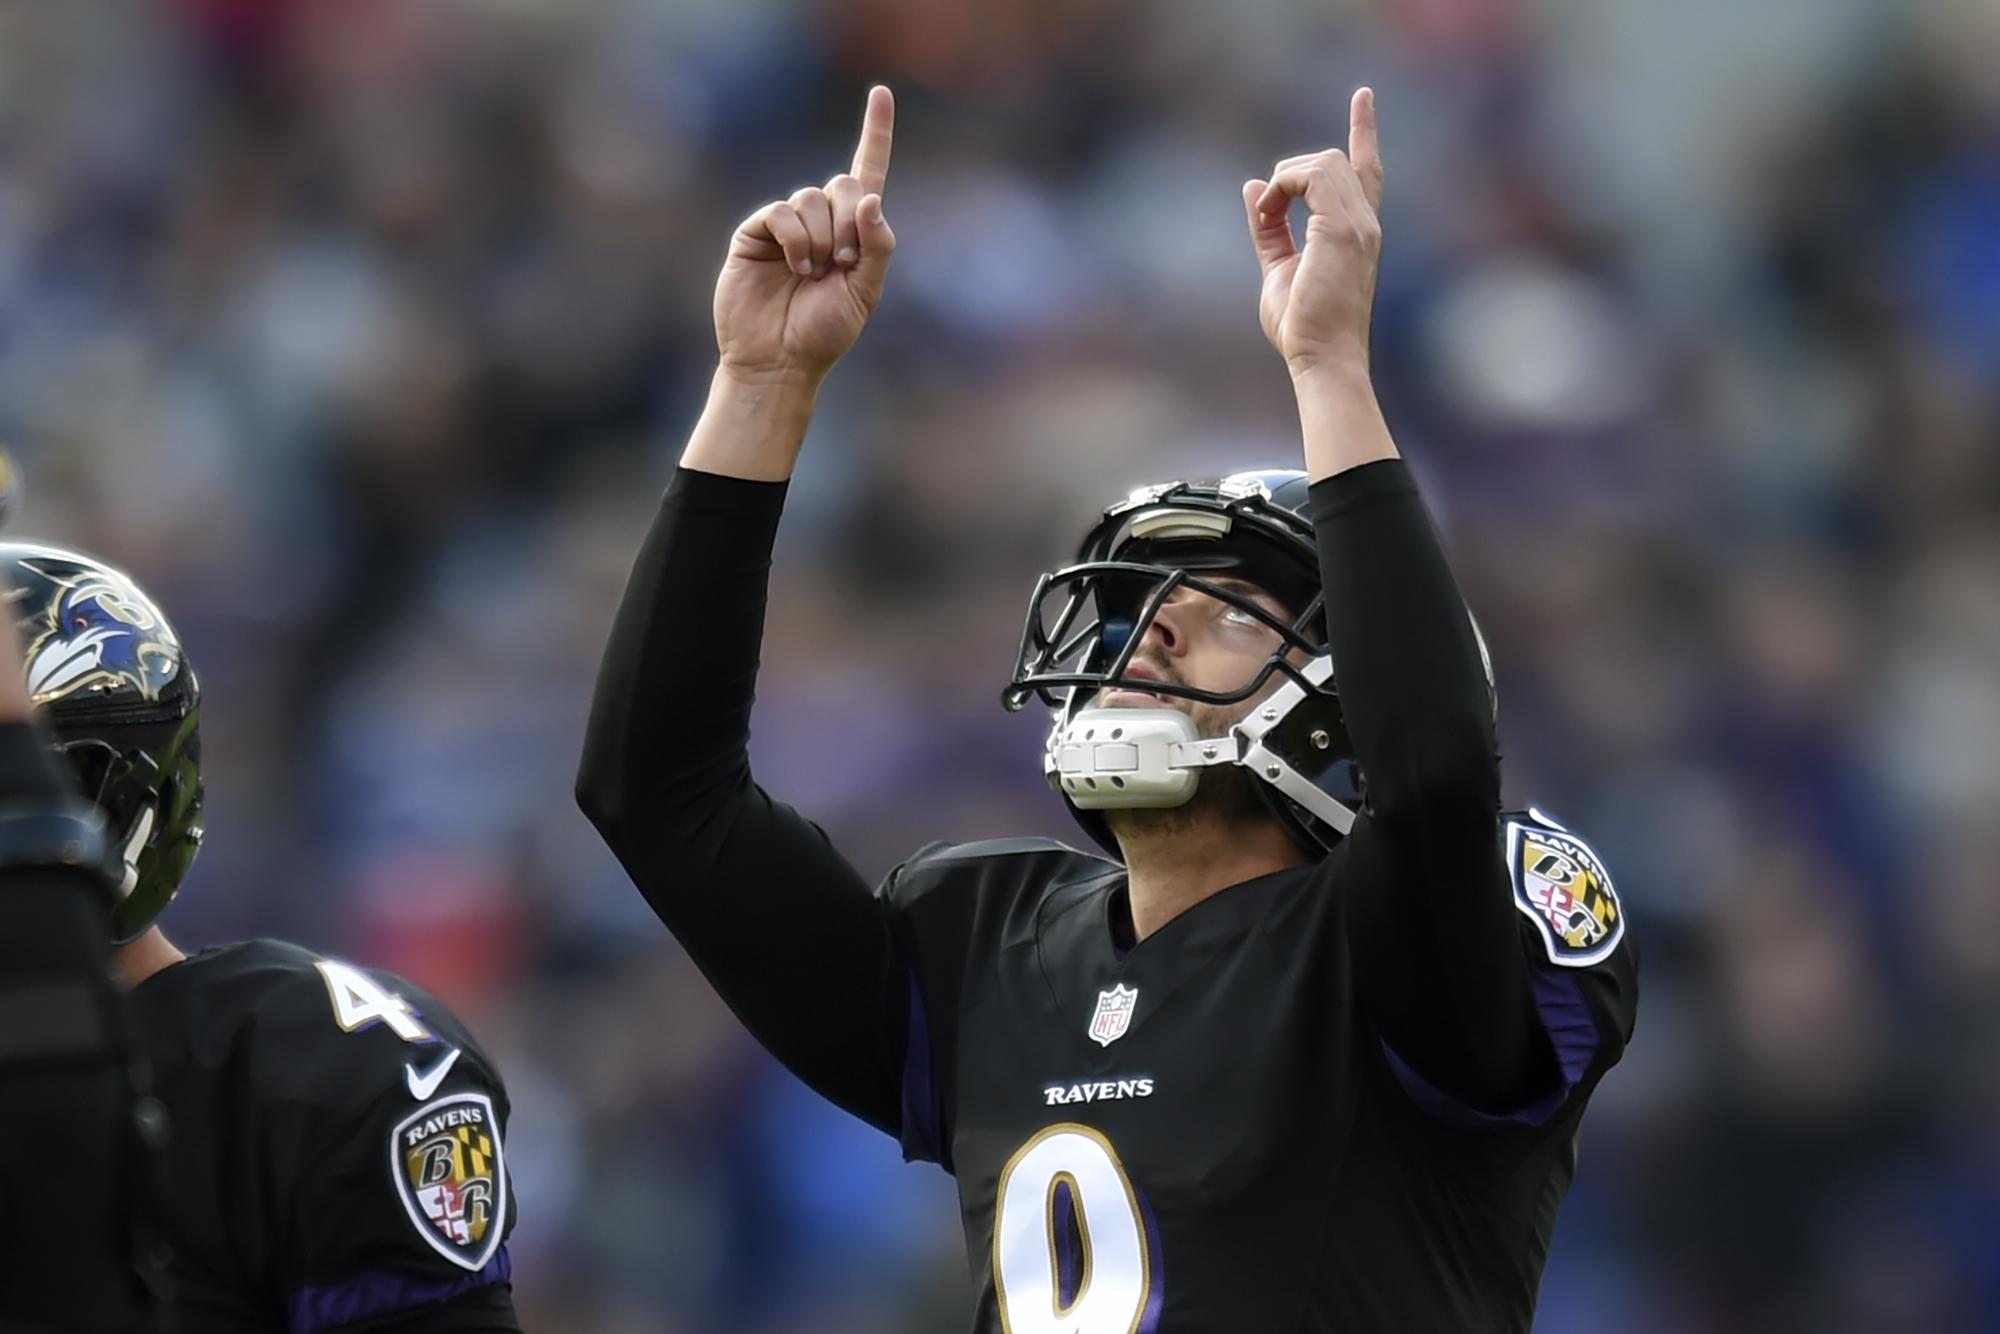 Baltimore Ravens kicker Justin Tucker (9) celebrates his field goal during the first half of an NFL football game against the Cincinnati Bengals in Baltimore, Sunday, Nov. 27, 2016. (AP Photo/Gail Burton)